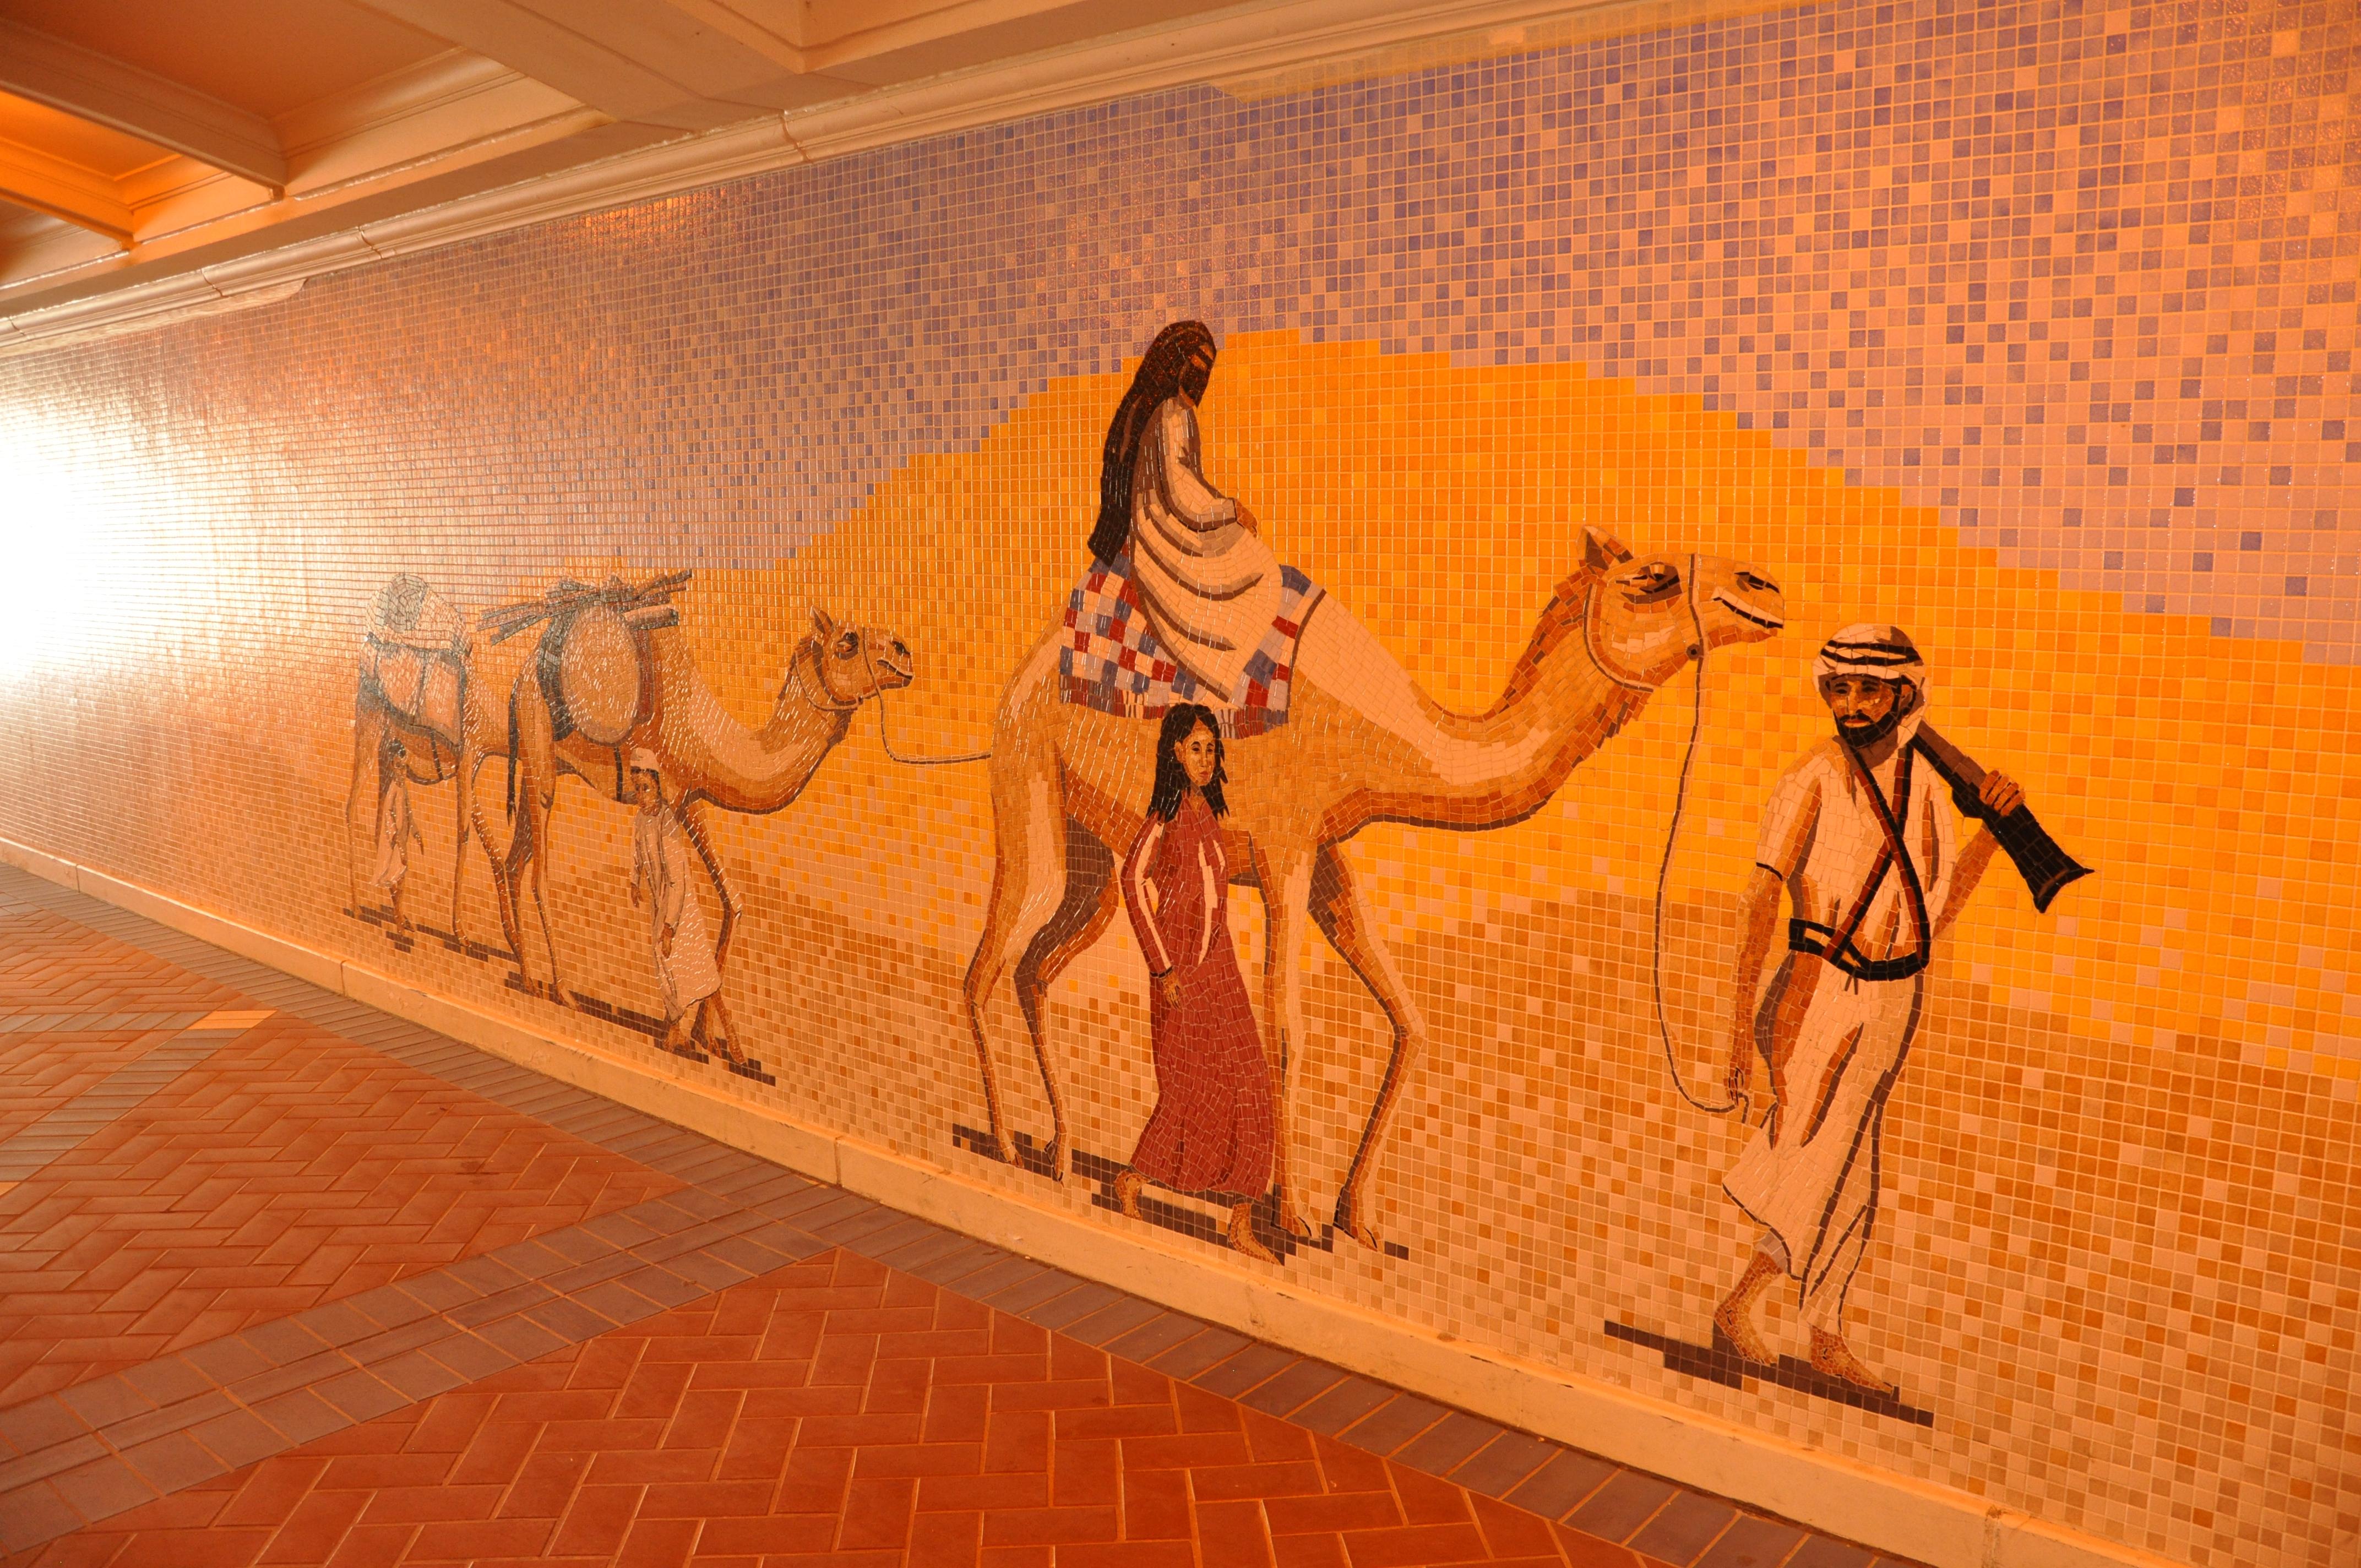 Underpass — in Abu Dhabi, United Arab Emirates.